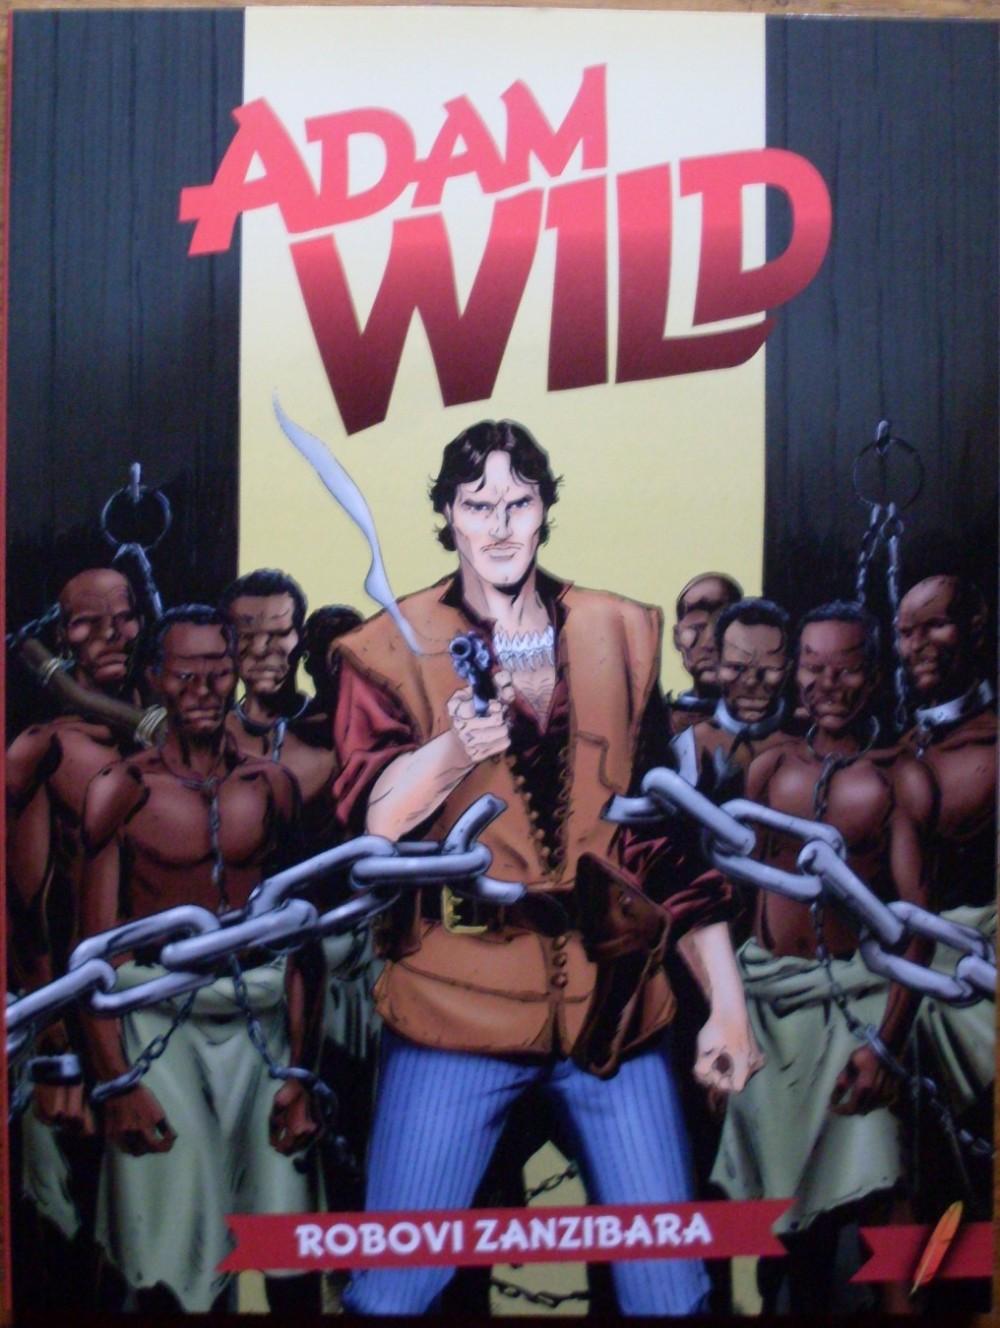 adam-wild-br-1-robovi-zanzibara_slika_o_38107013